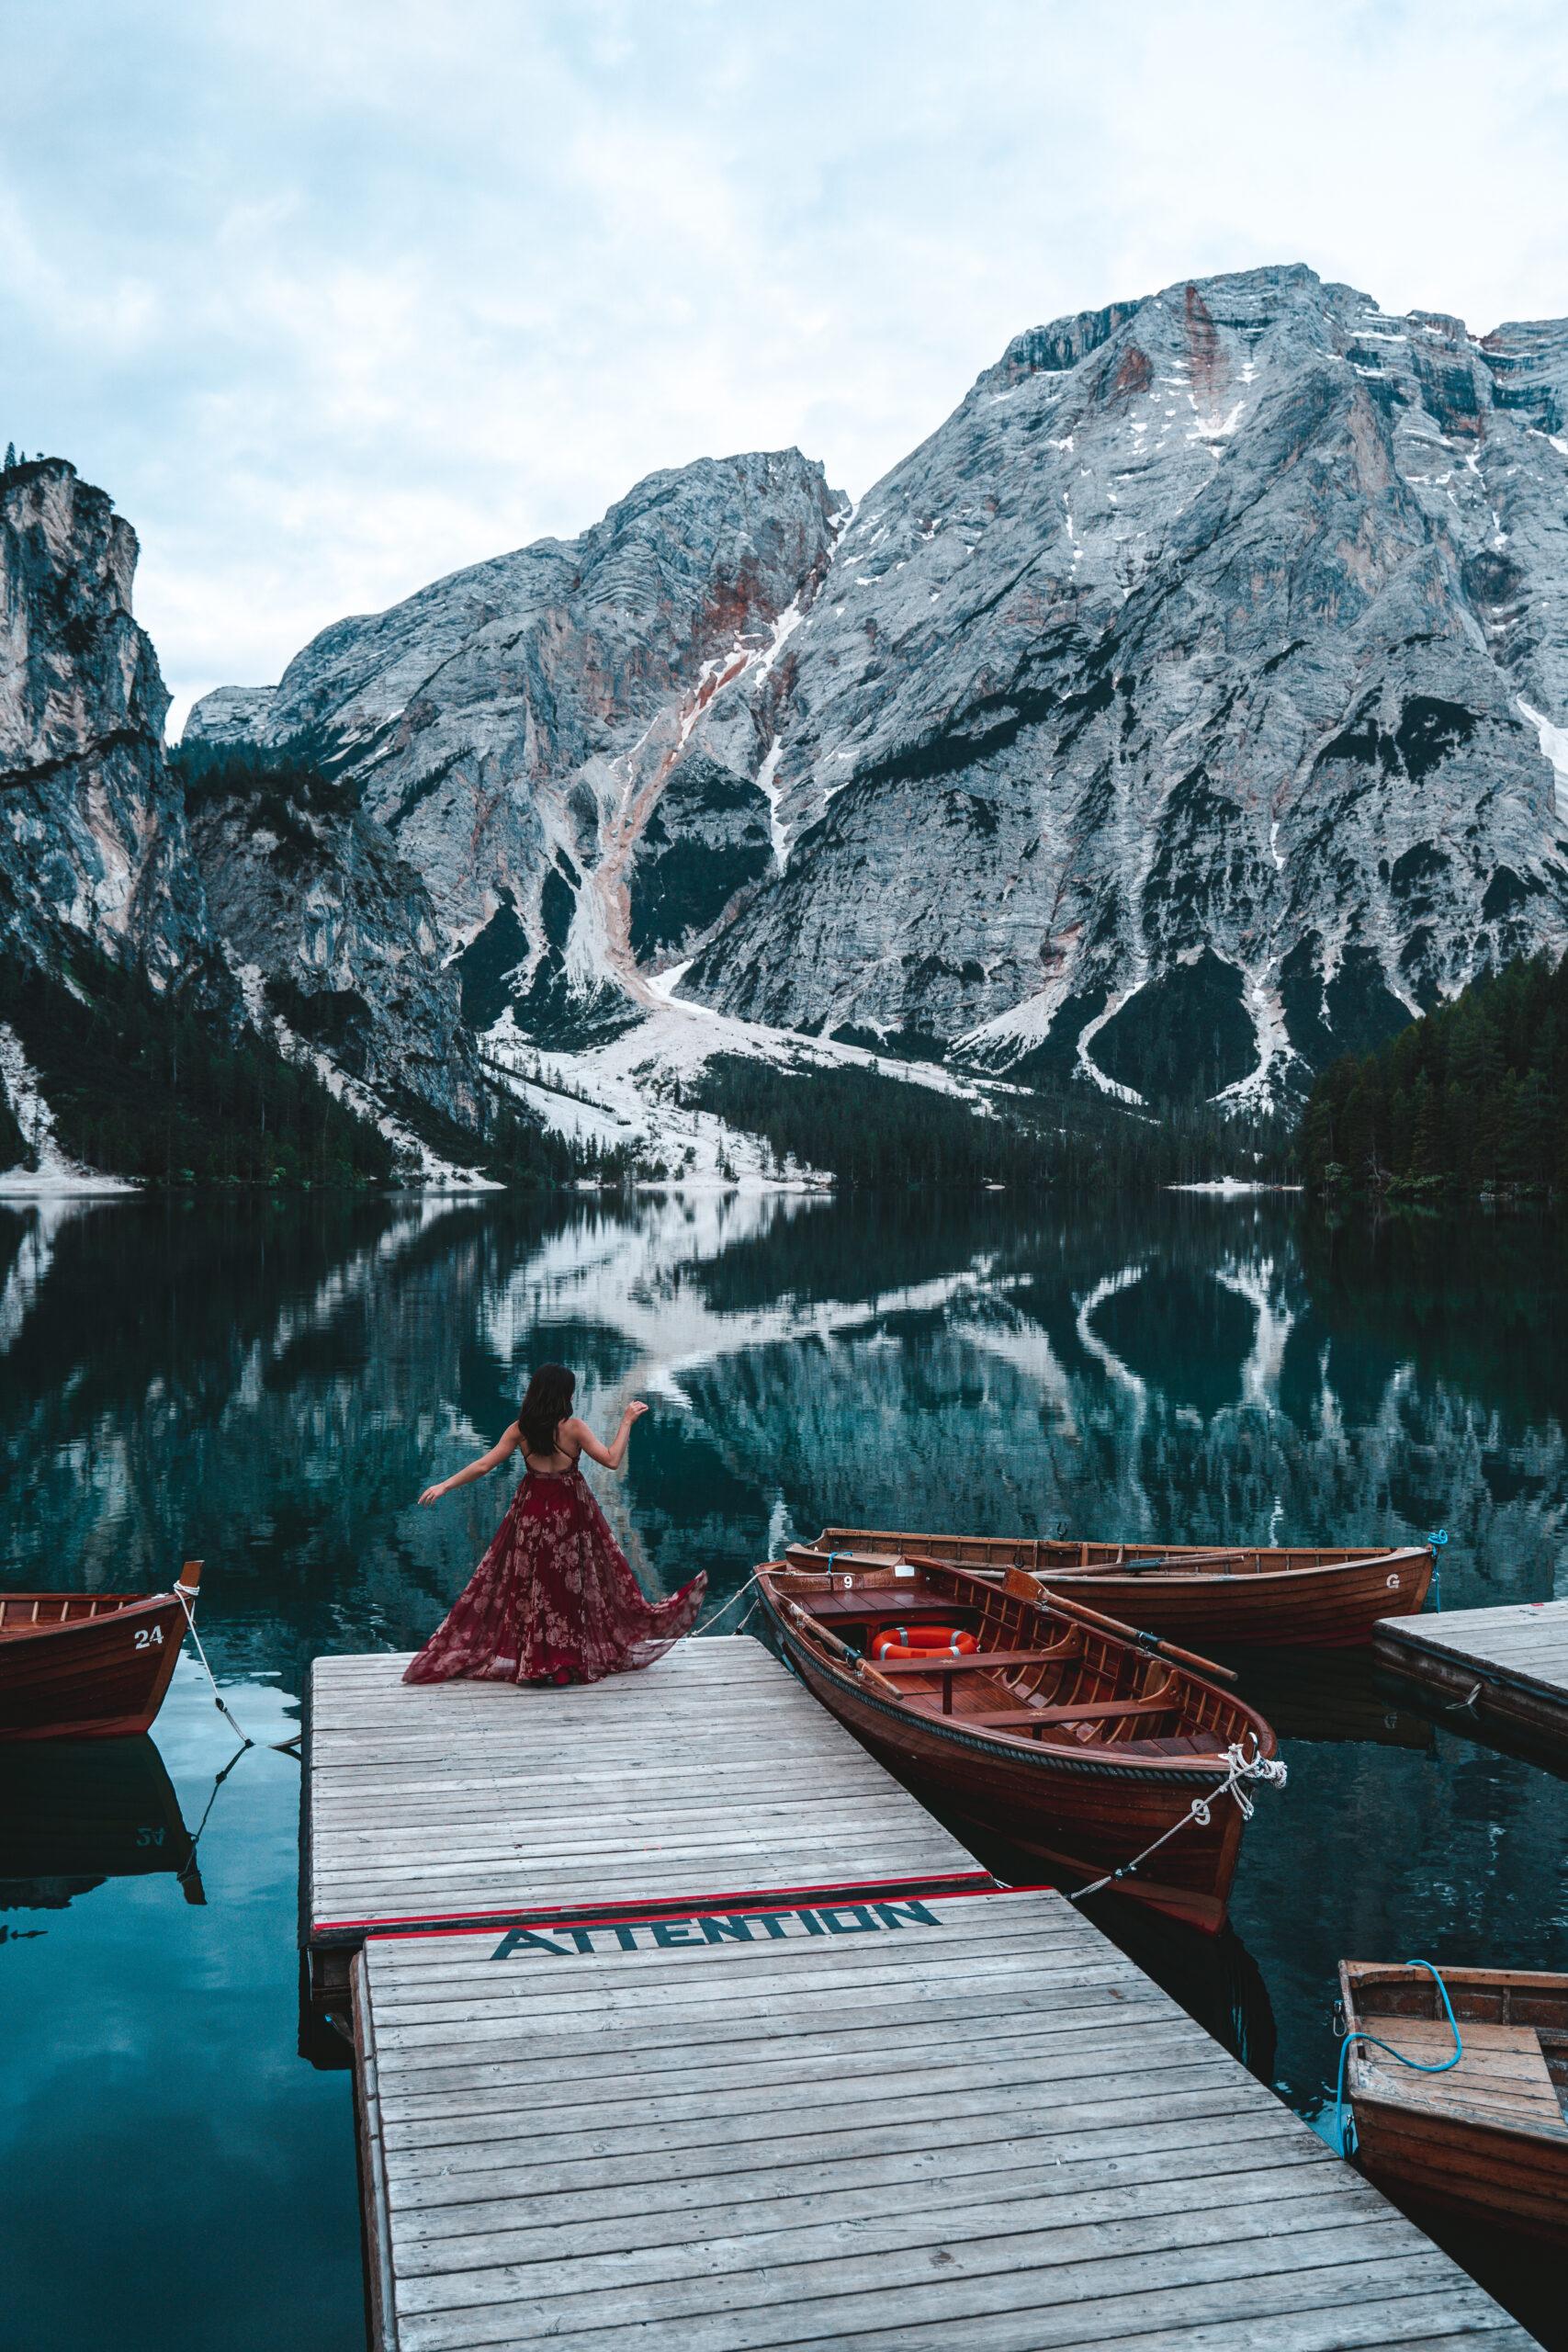 Where to take photos at lago di braies